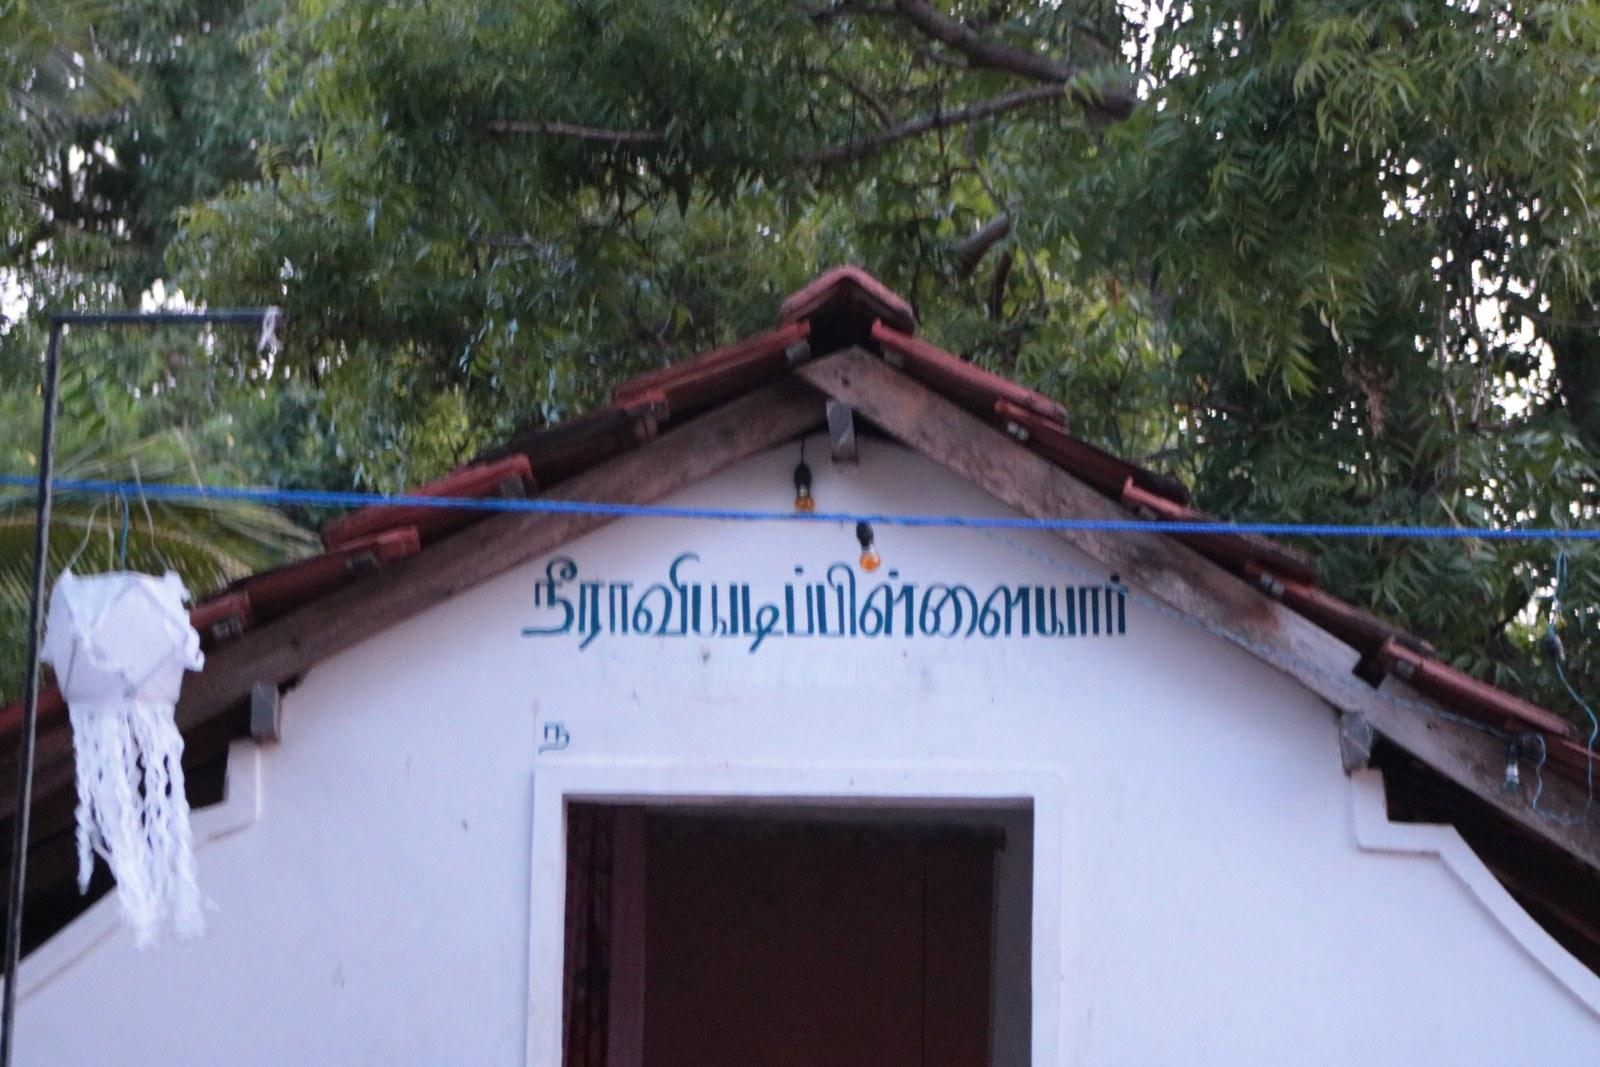 Court orders Bhikku to remove immediately CCTV cameras from Neeraviyadi Temple